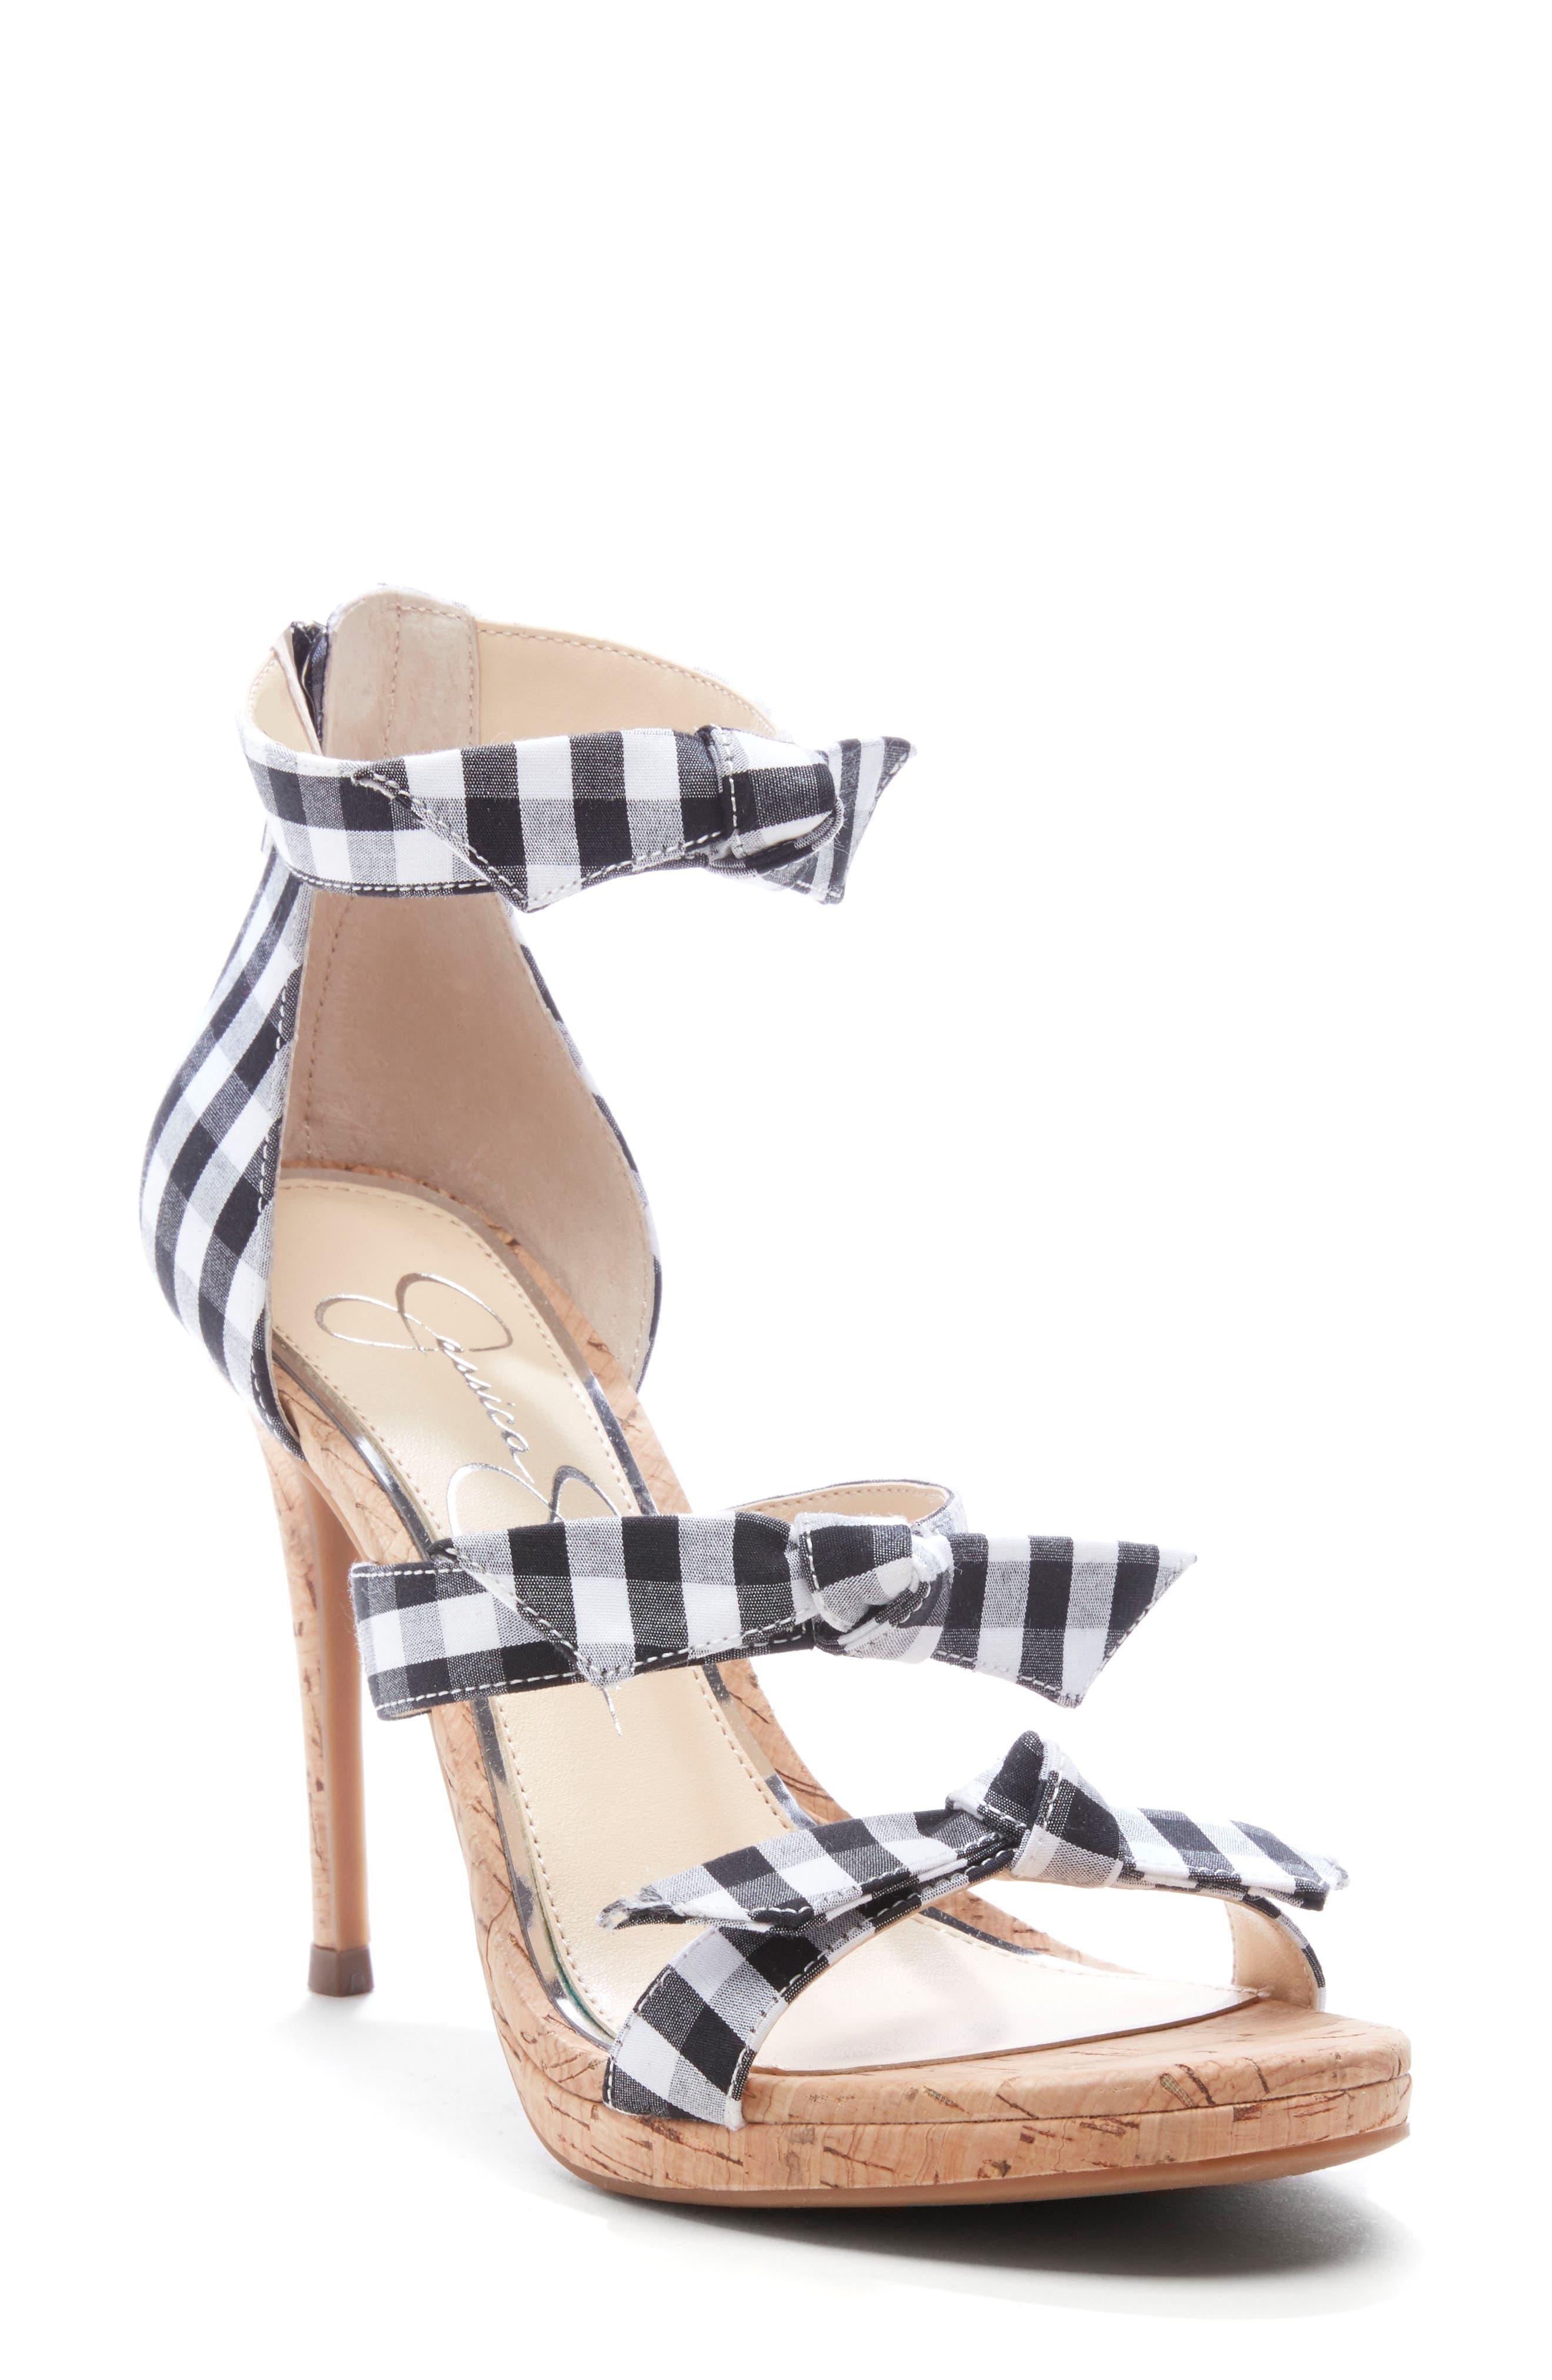 Jessica Simpson Kaycie Ankle Strap Sandal- Black